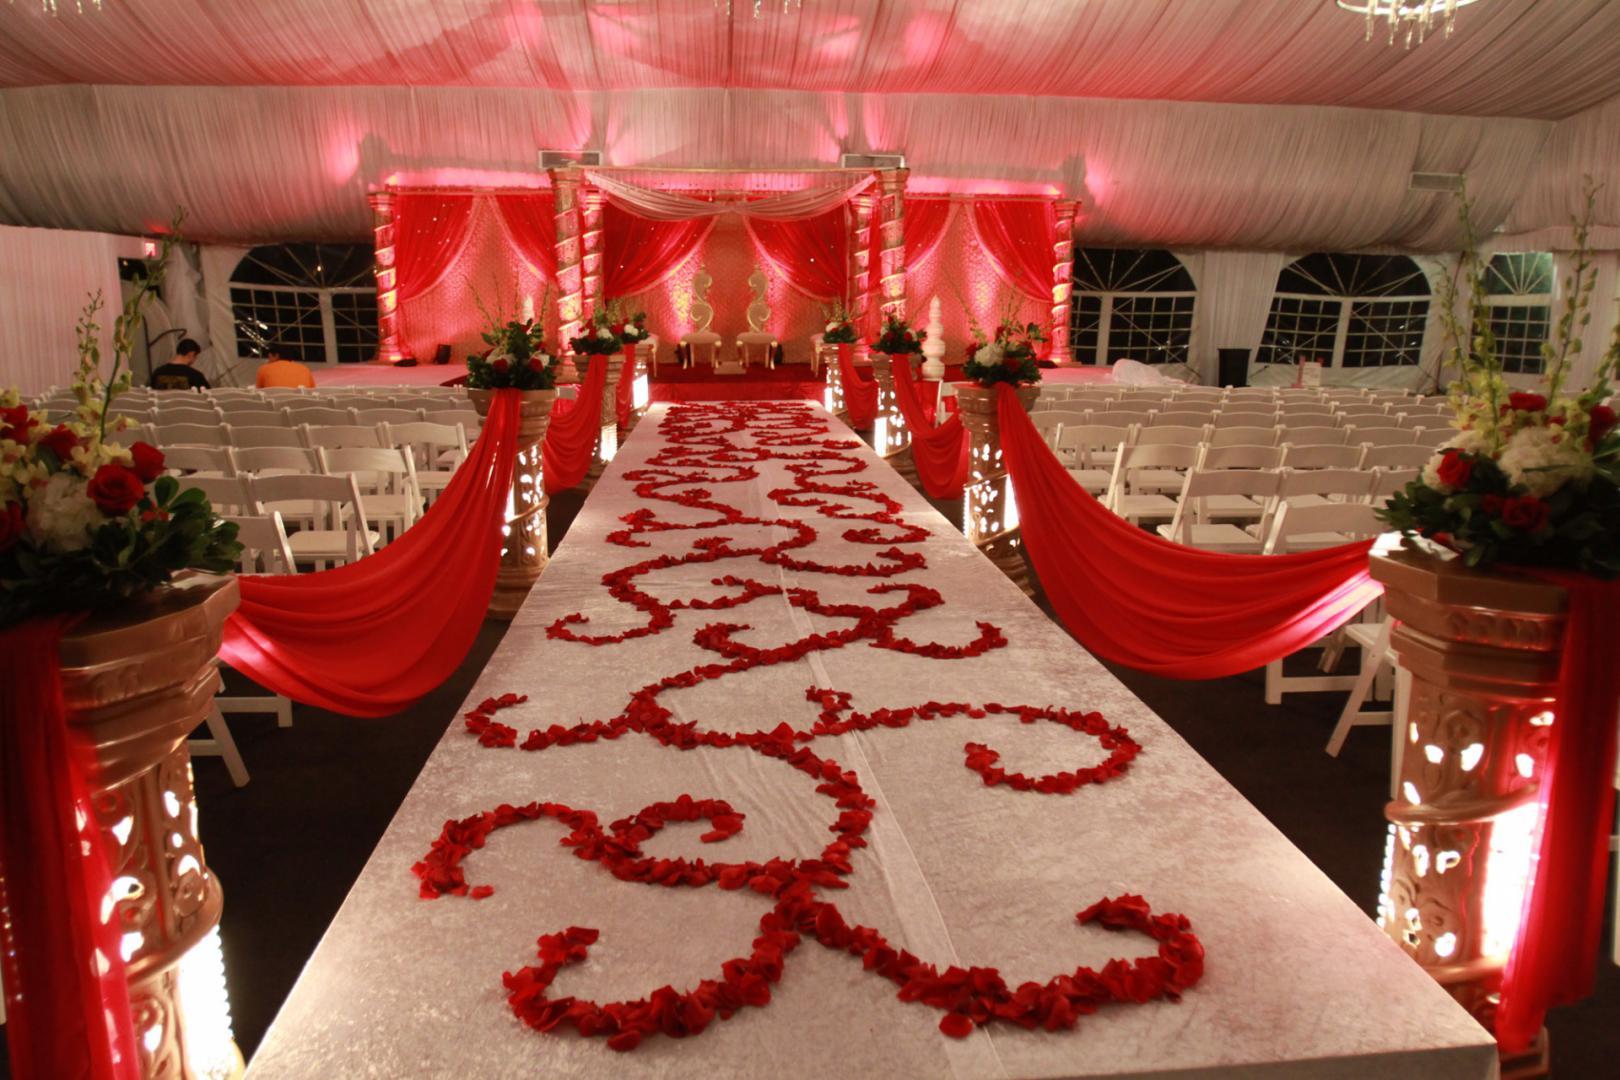 welcome my first blog floral designs wedding aisles wedding aisle decorations red rose petal aisle design indian wedding decor mandap